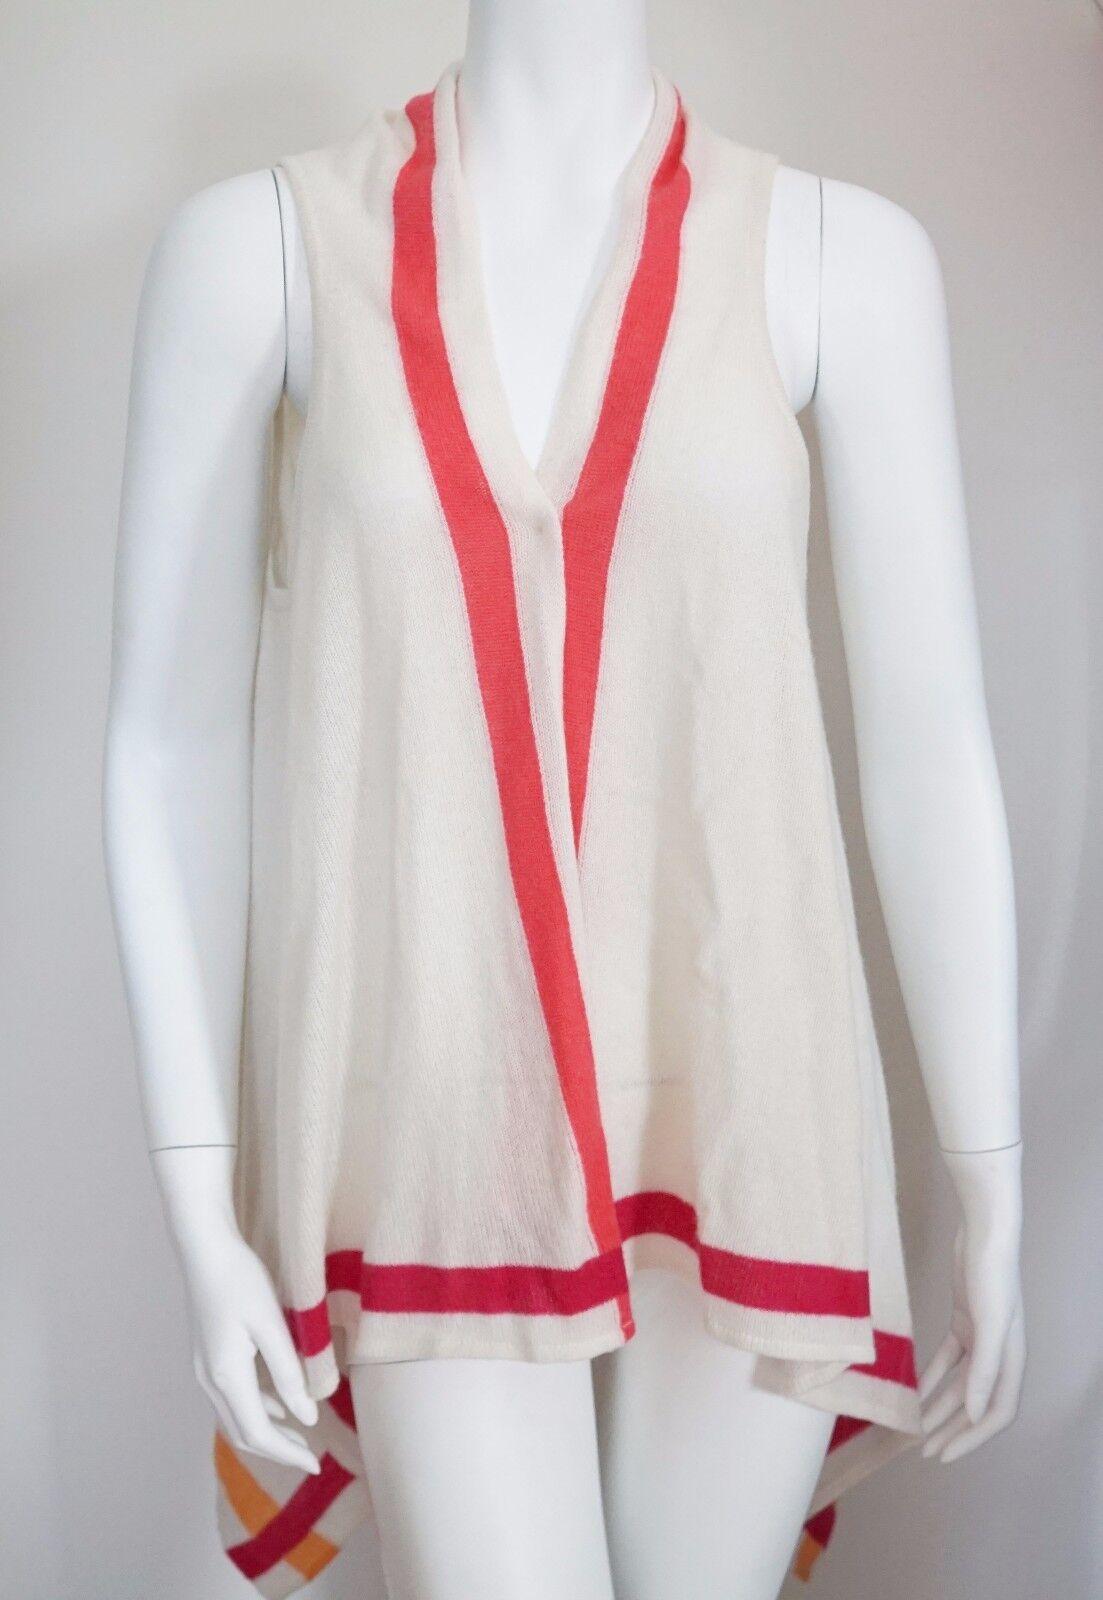 NWT Authentic IN CASHMERE Cream 100% CASHMERE Open Front Cardigan Vest L XL